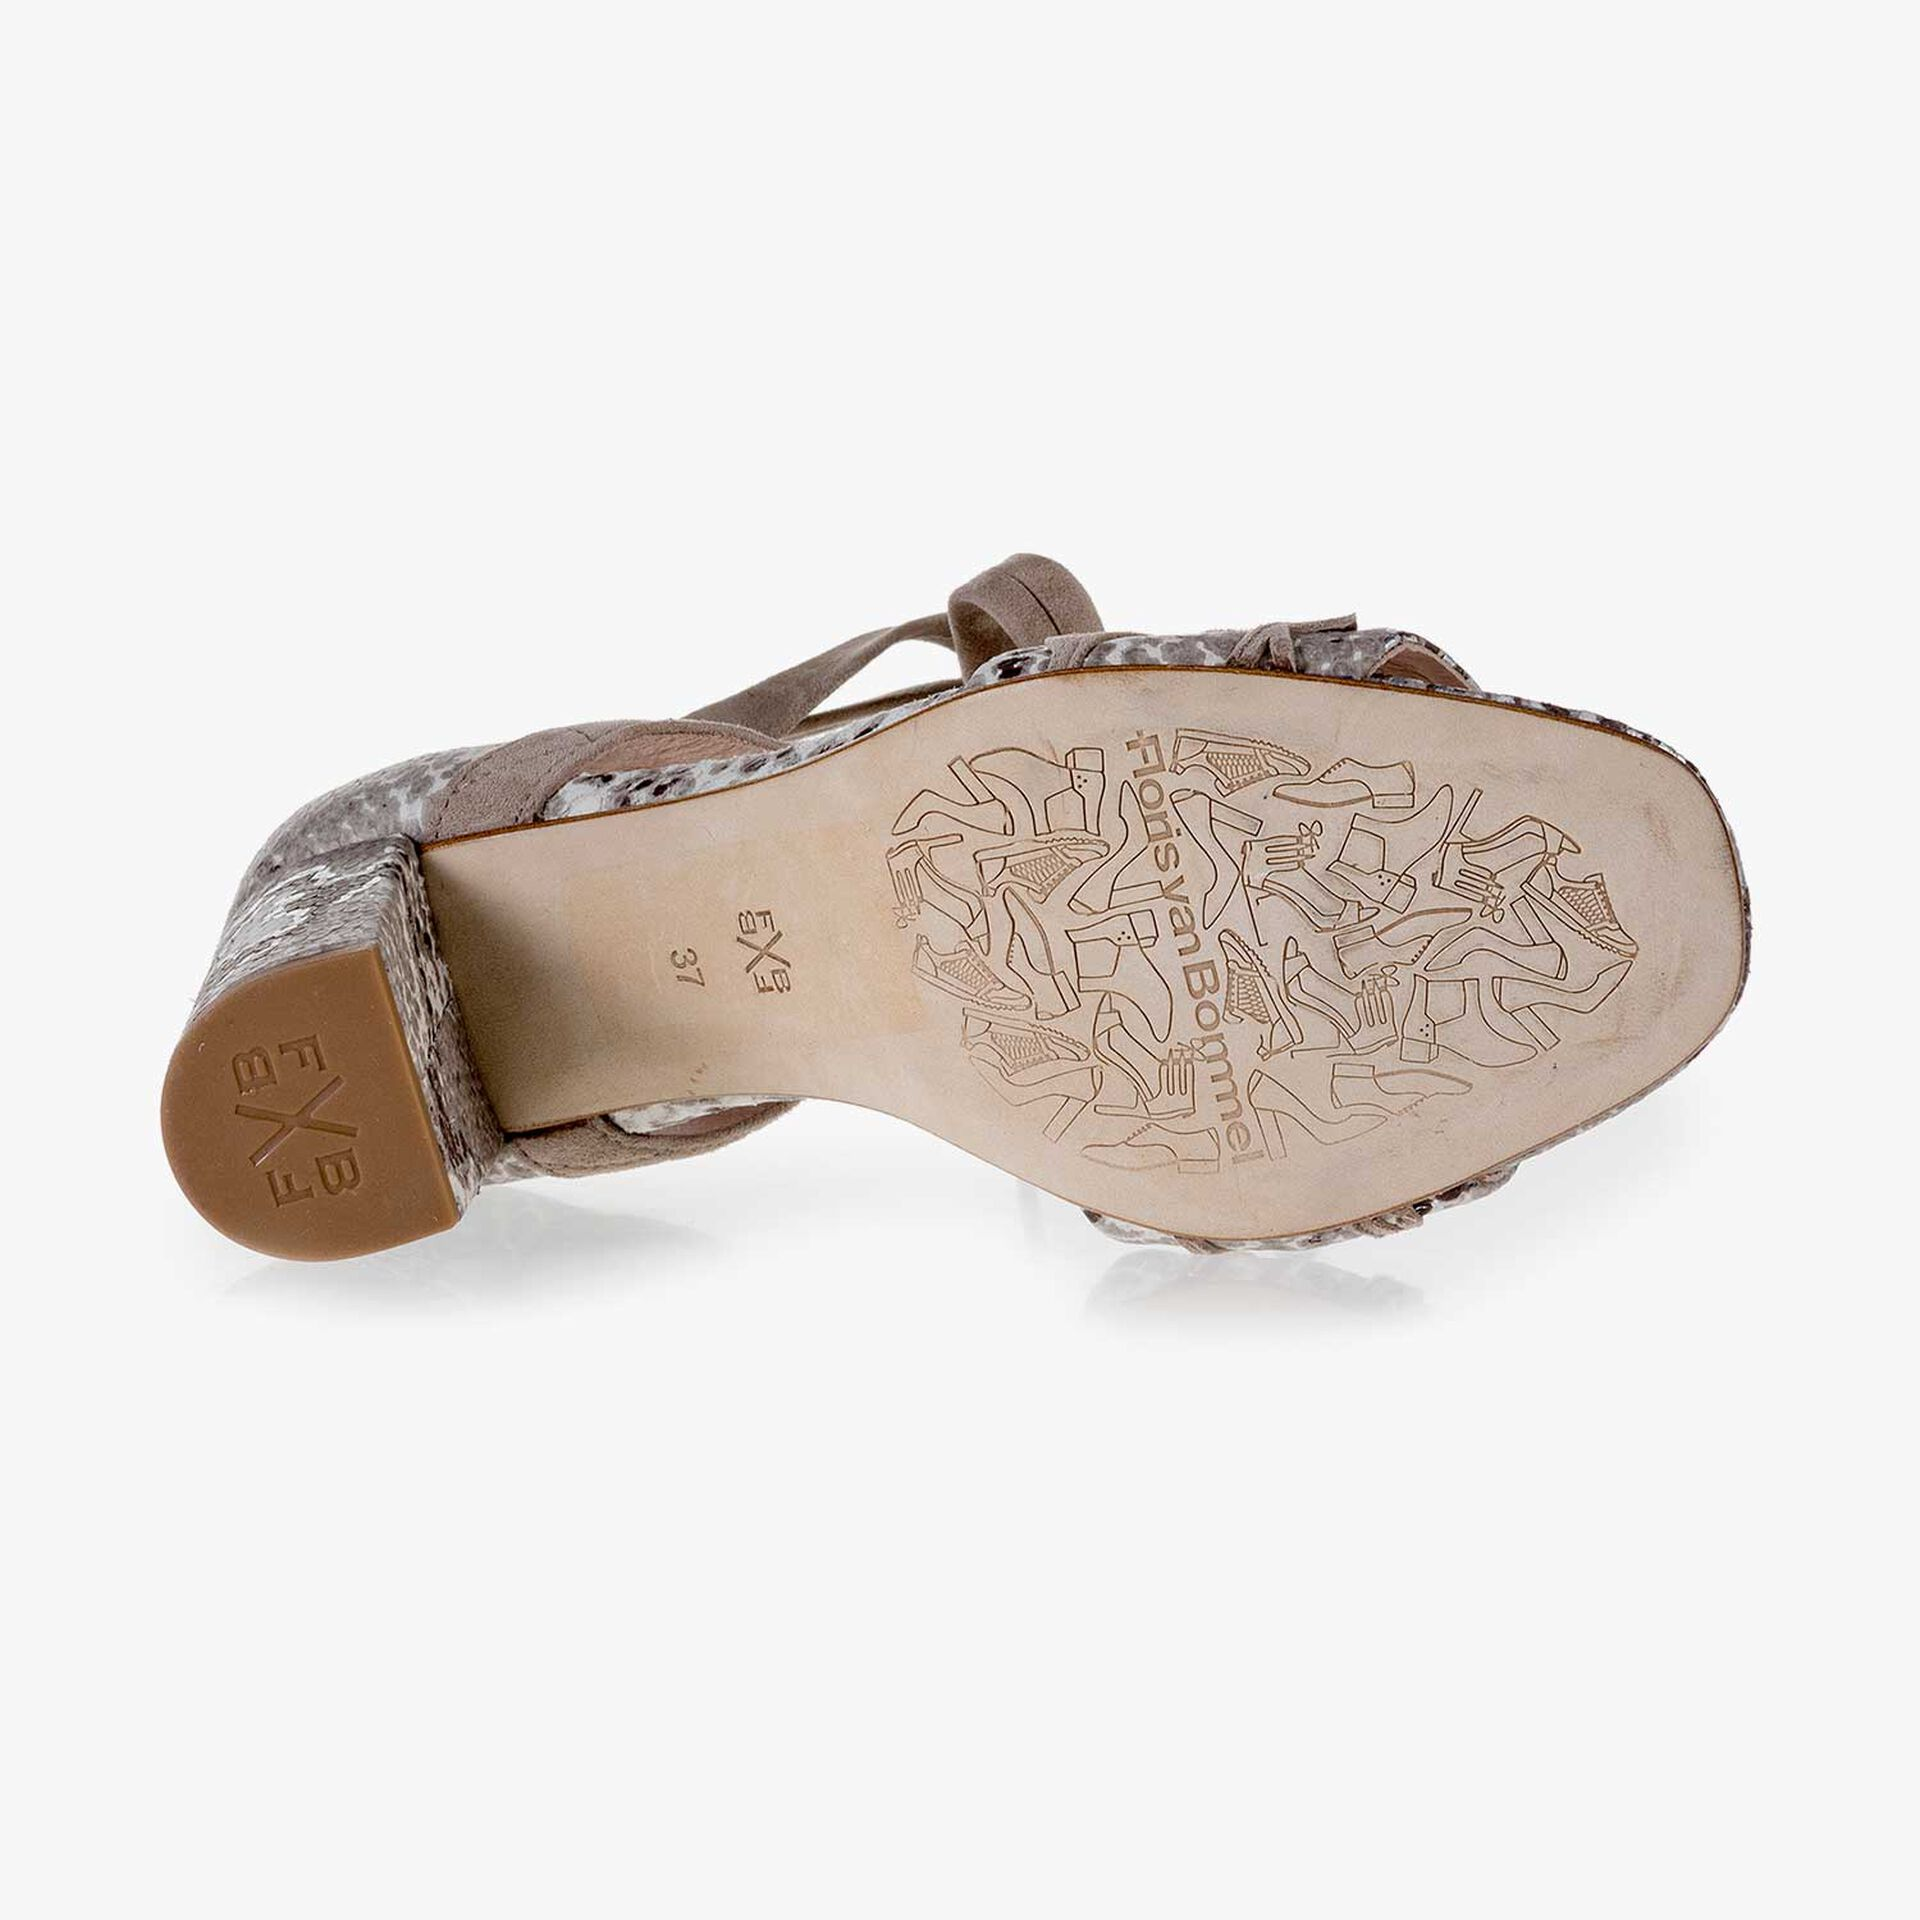 Taupekleurige suède sandaal met snakeprint